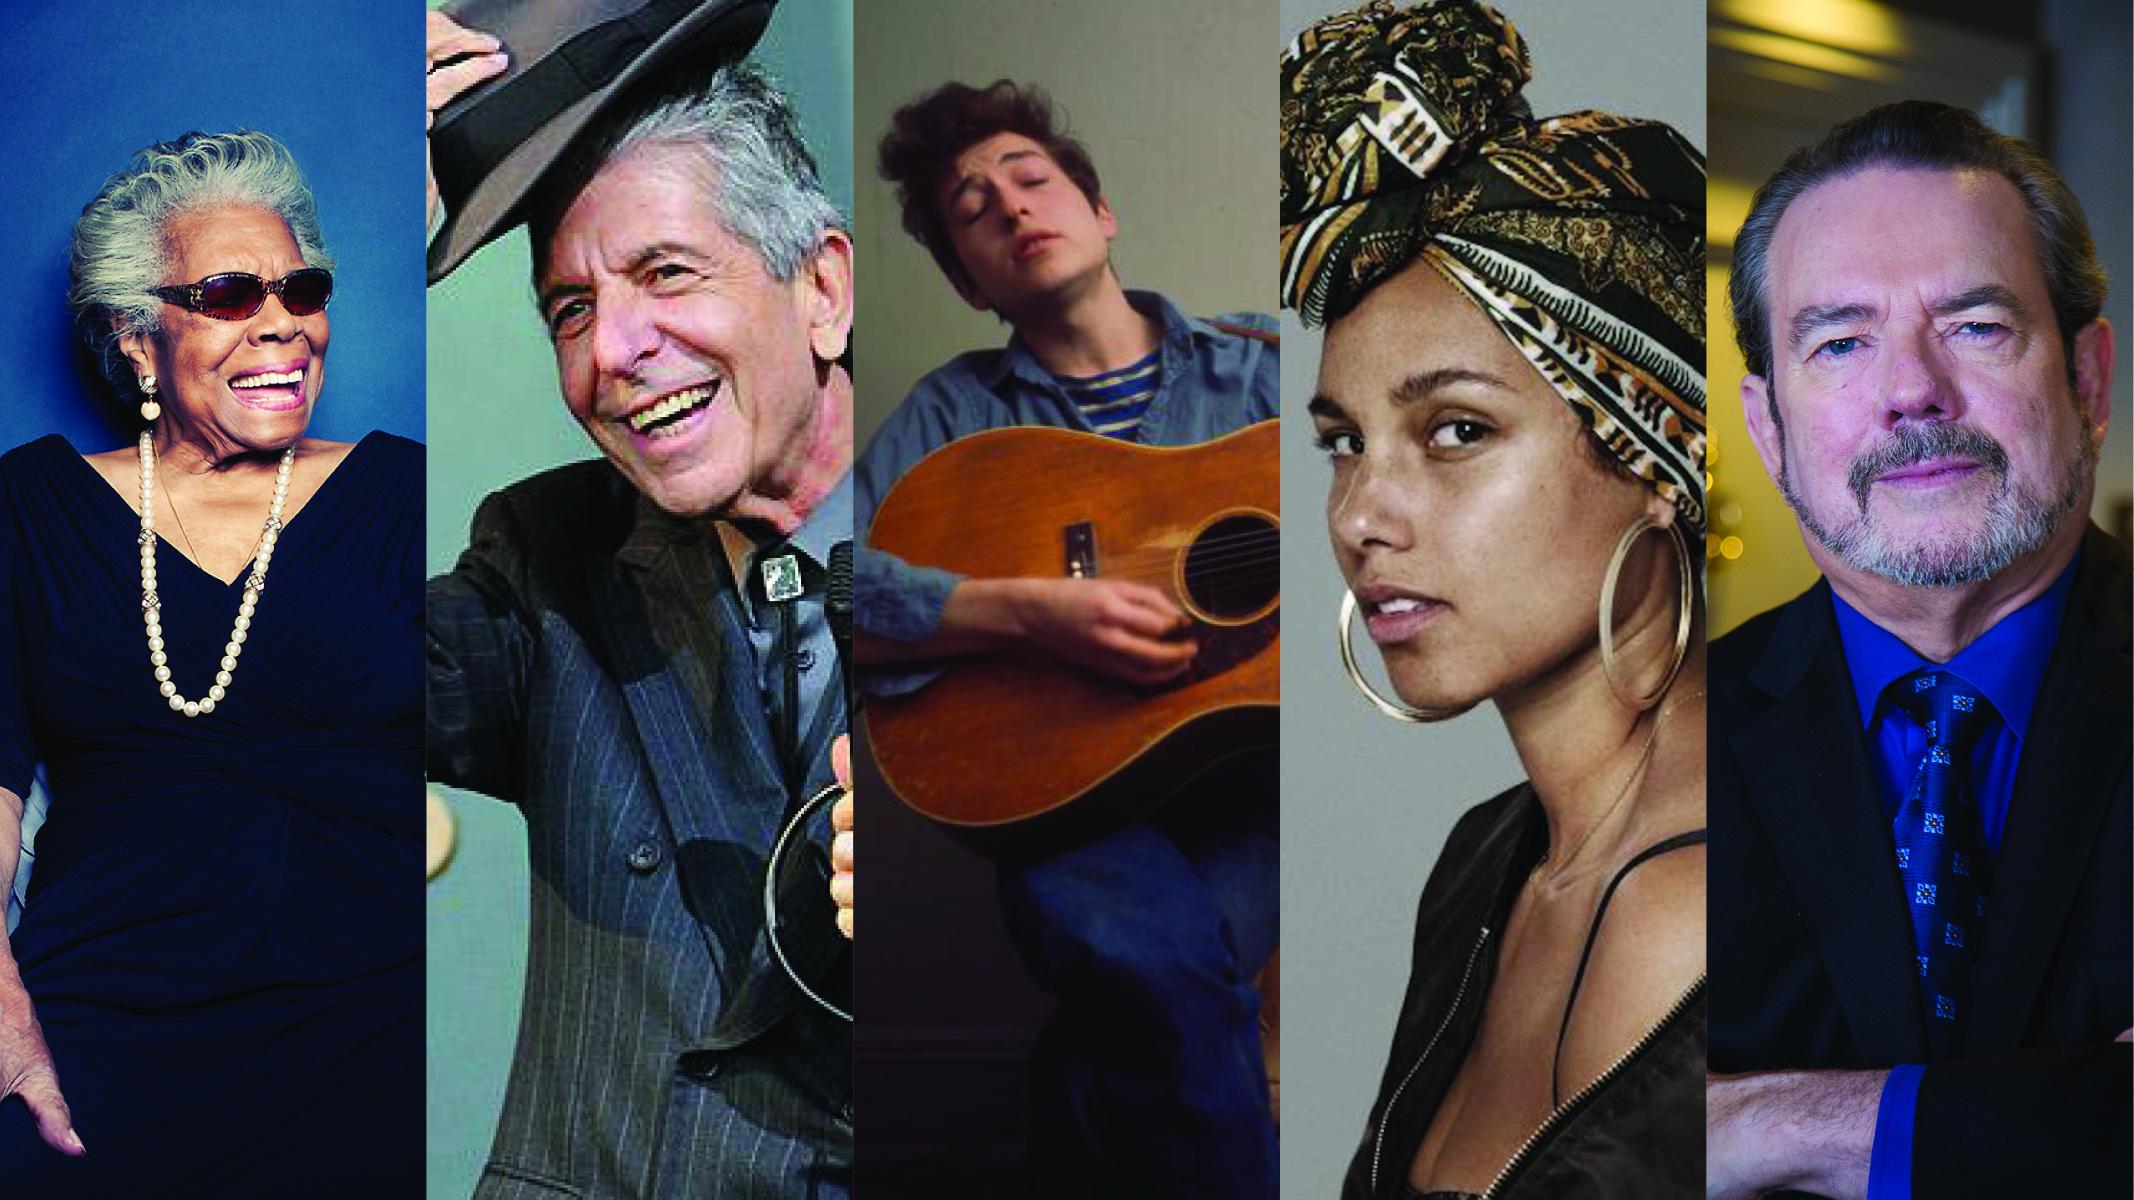 Poetic musicians